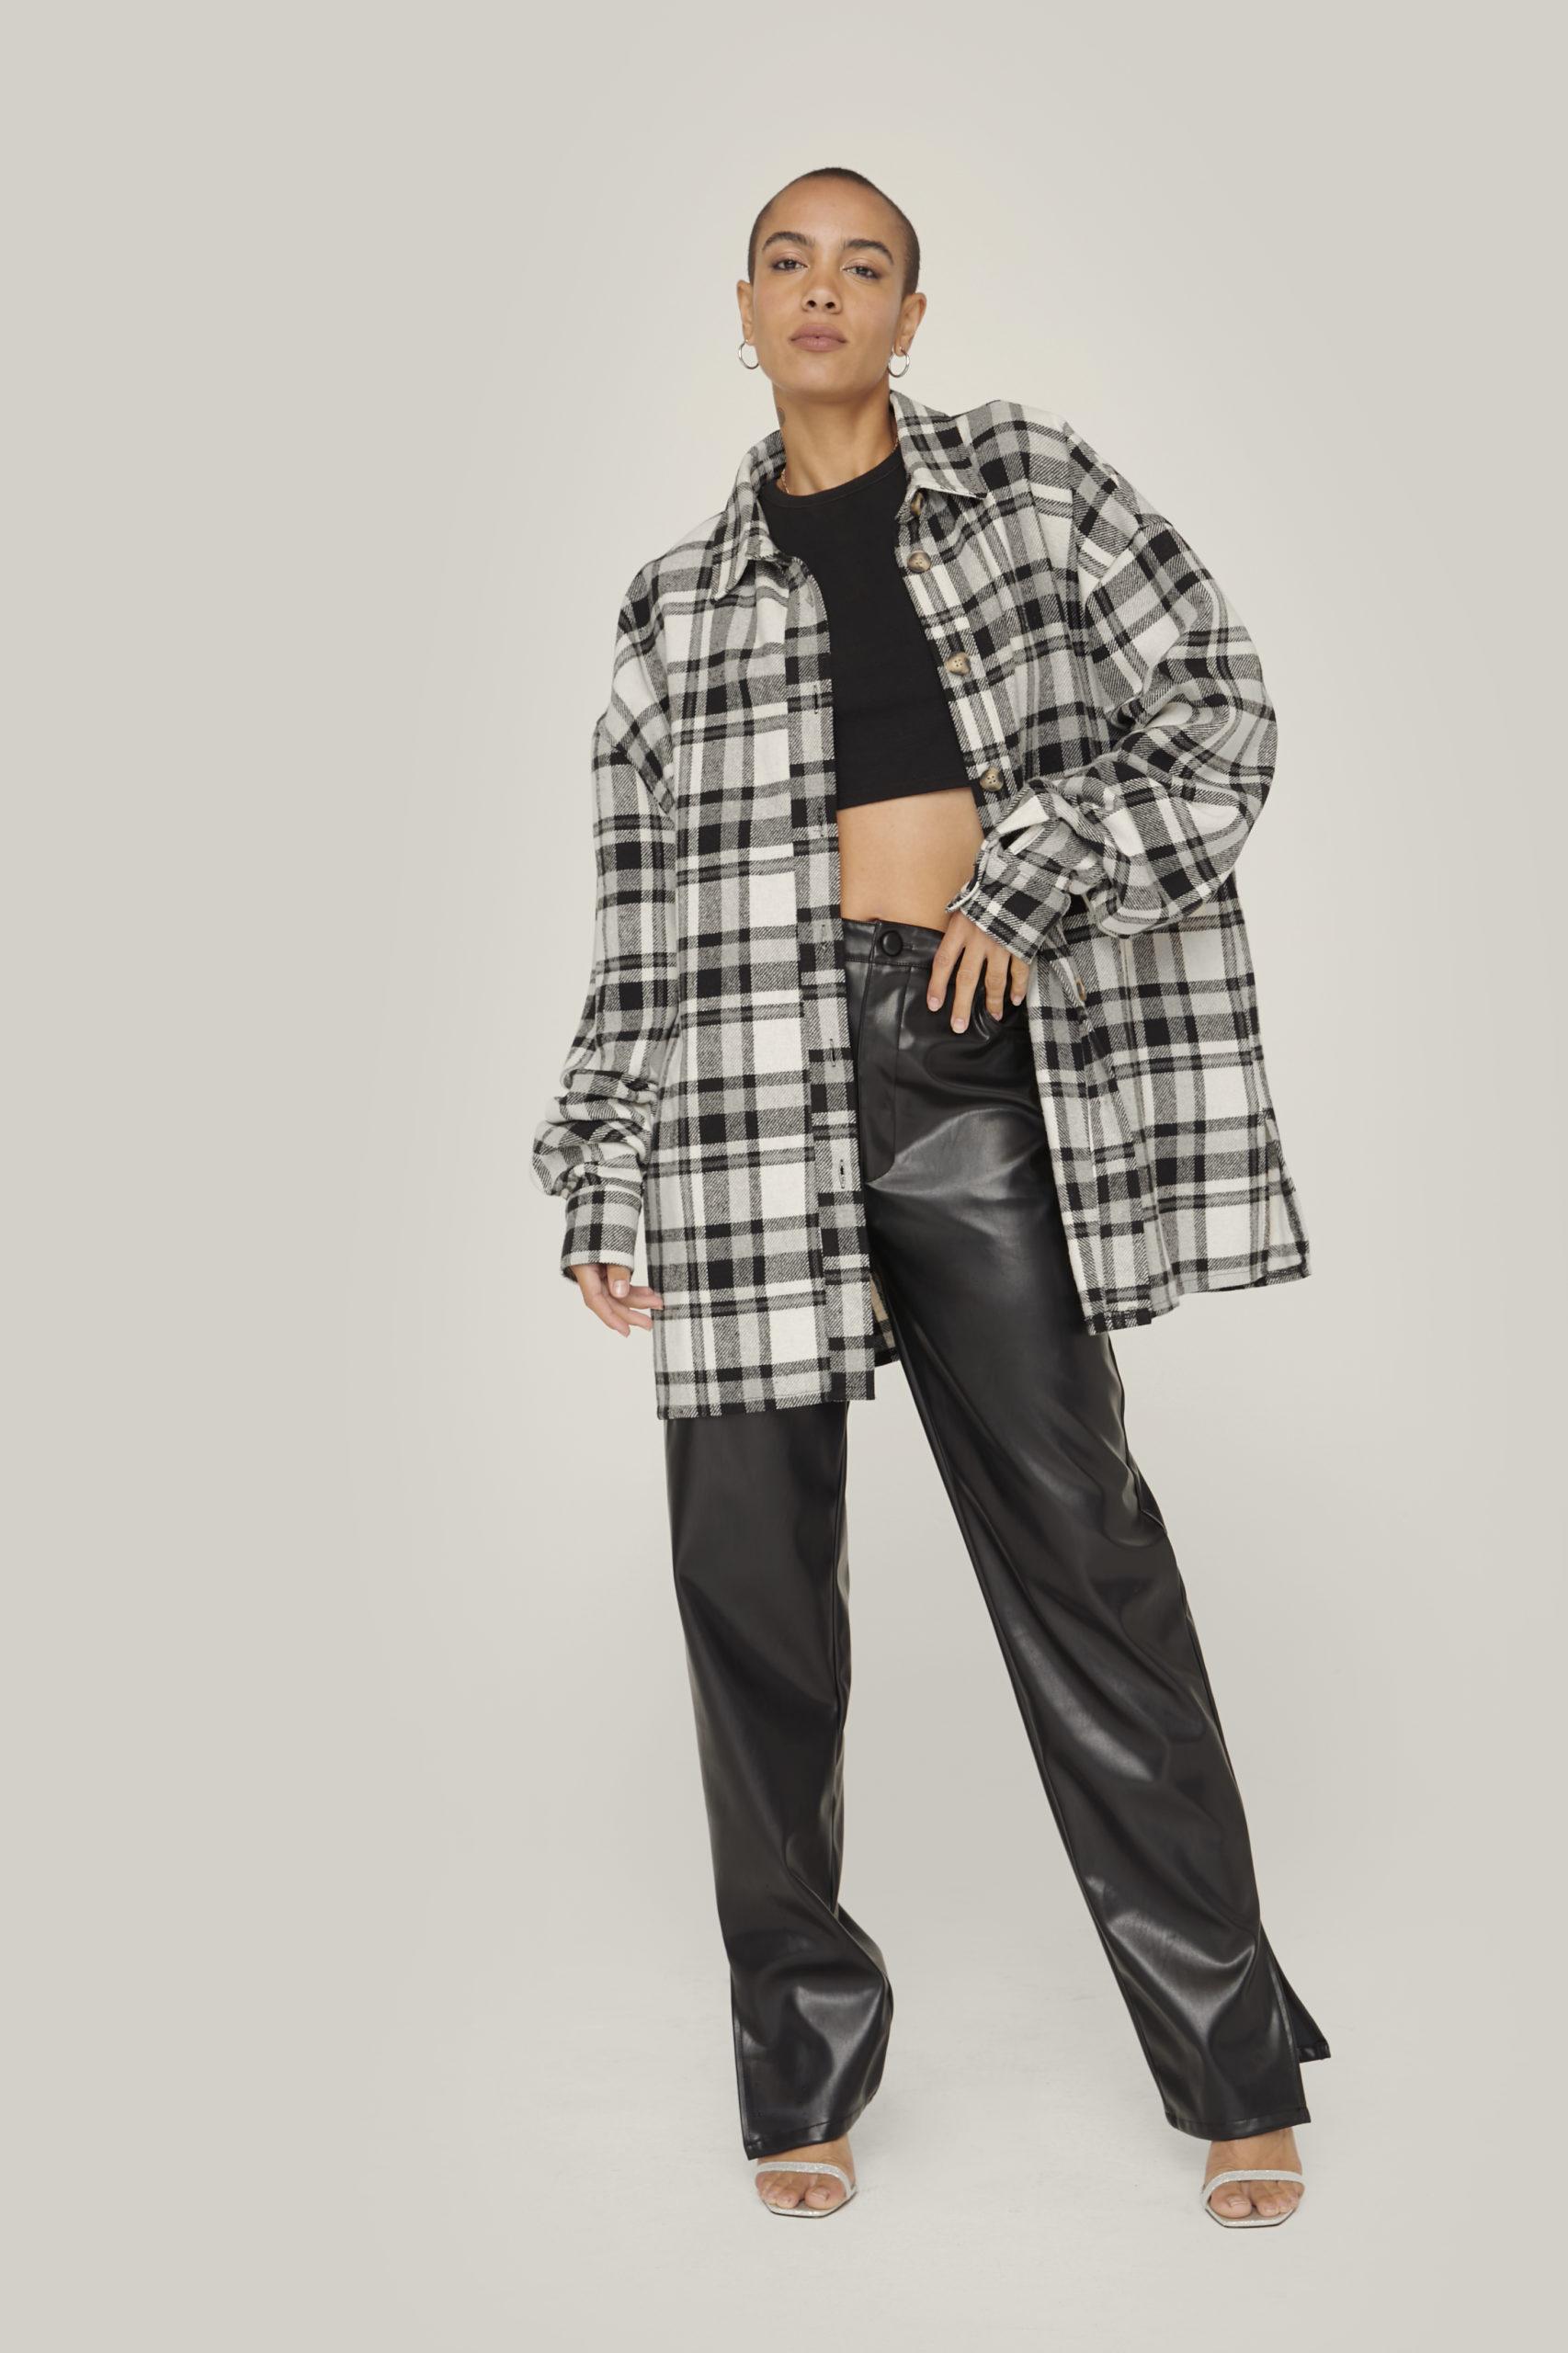 Monochrome Oversized Flannel Jacket